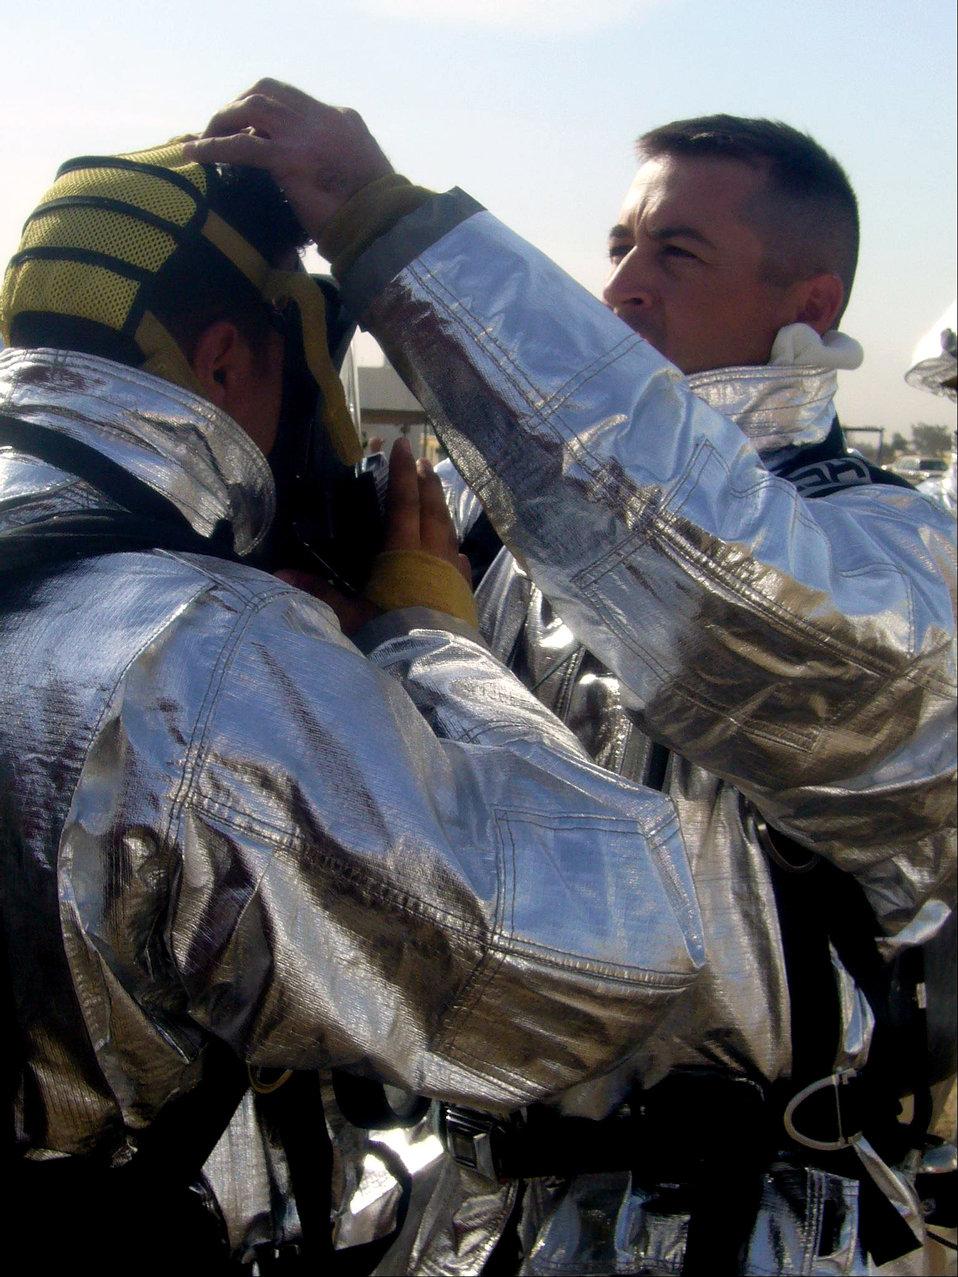 Iraqi Air Force Training School graduates firefighters, officers